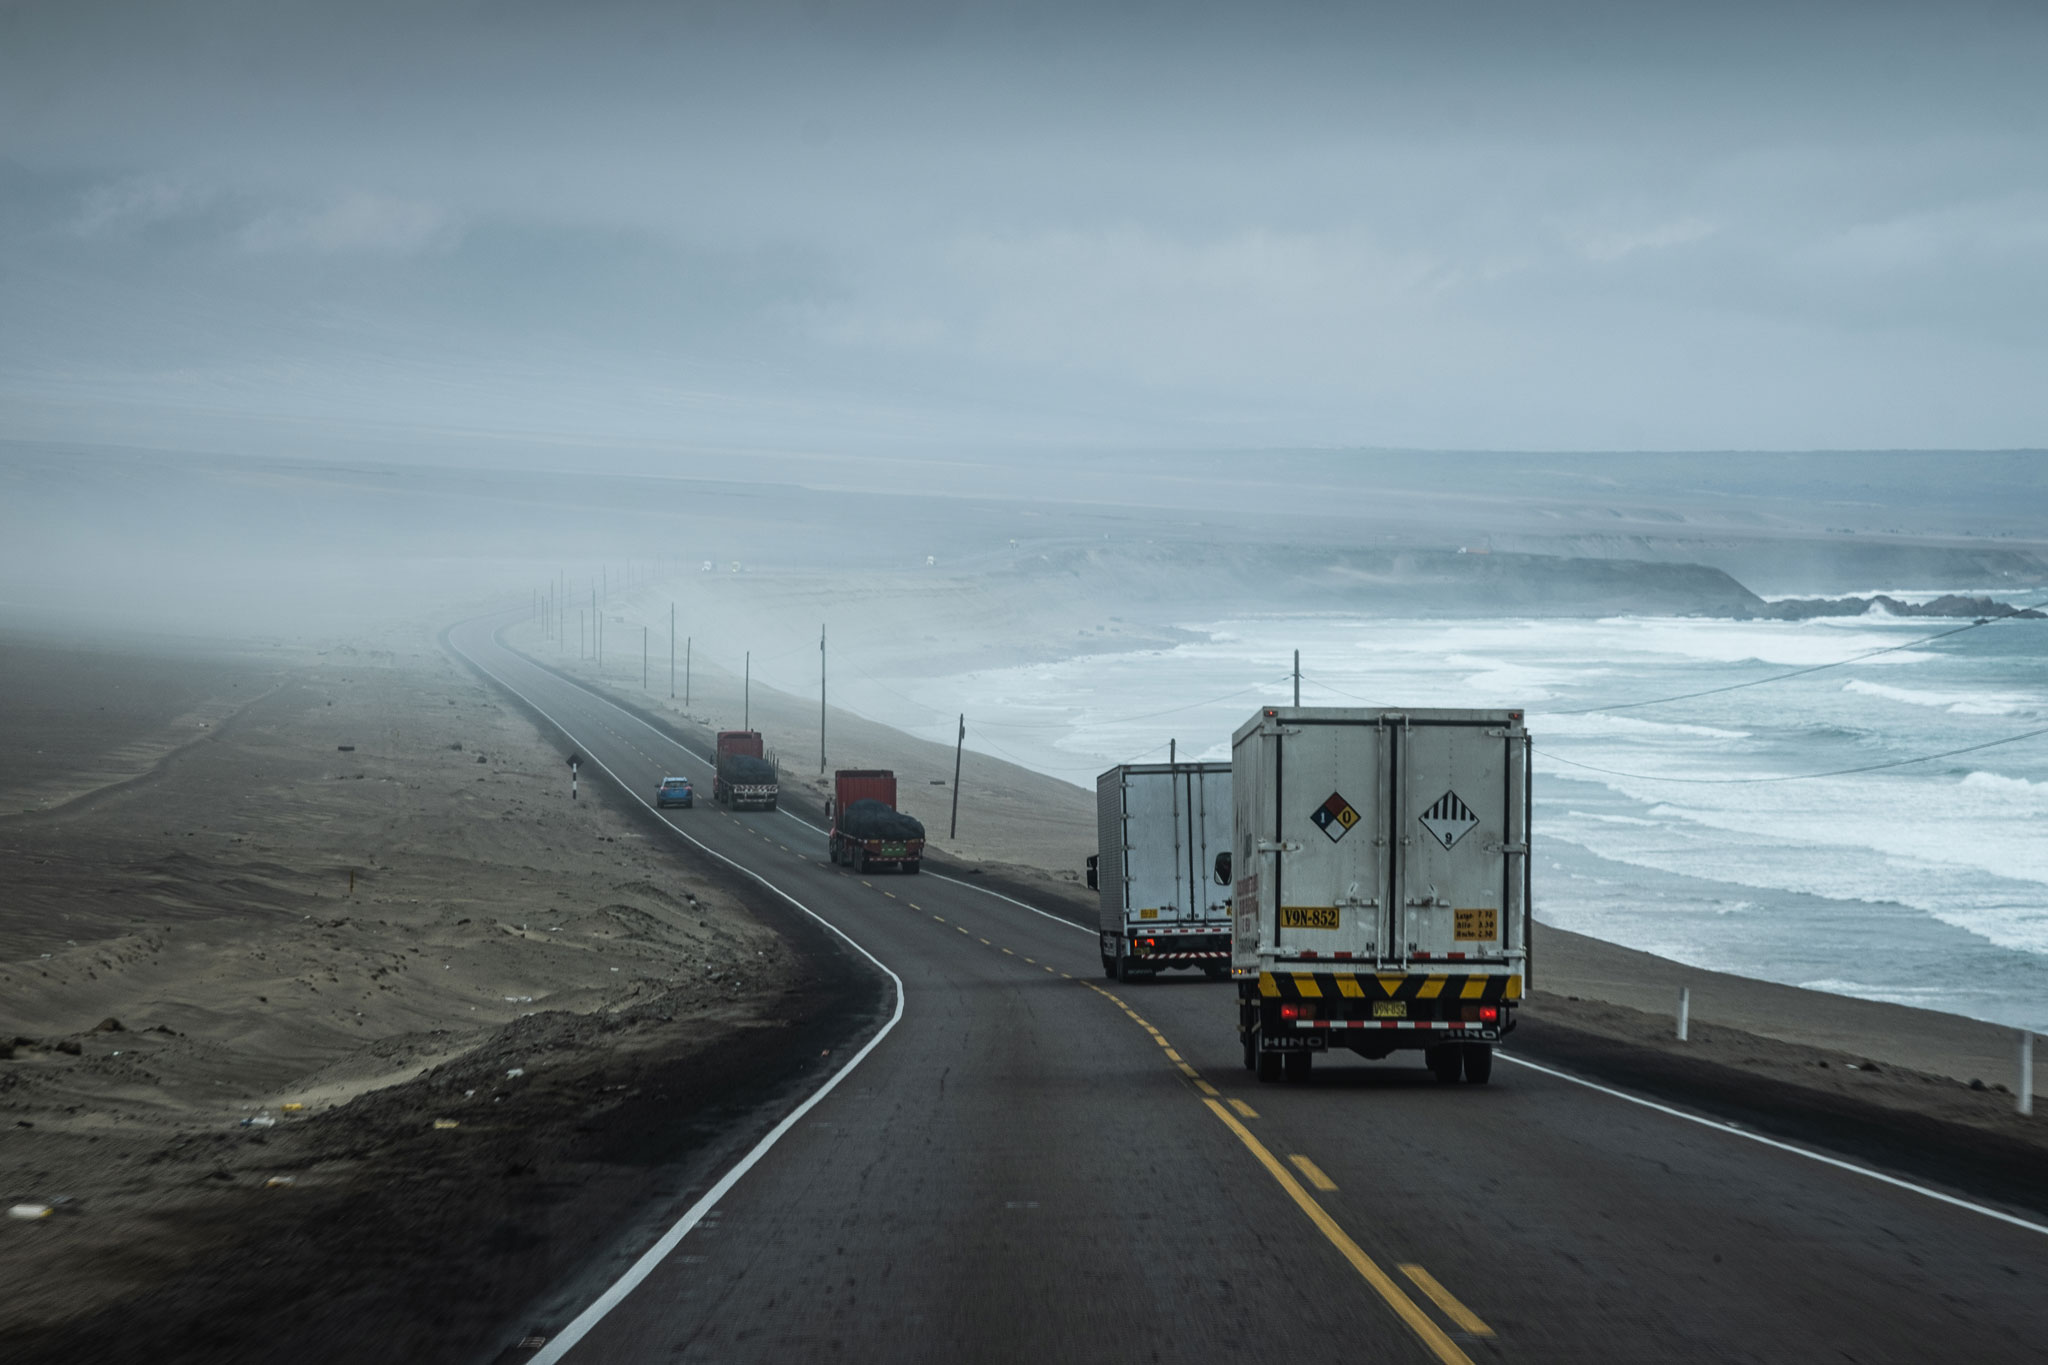 panamericana-highway-peru